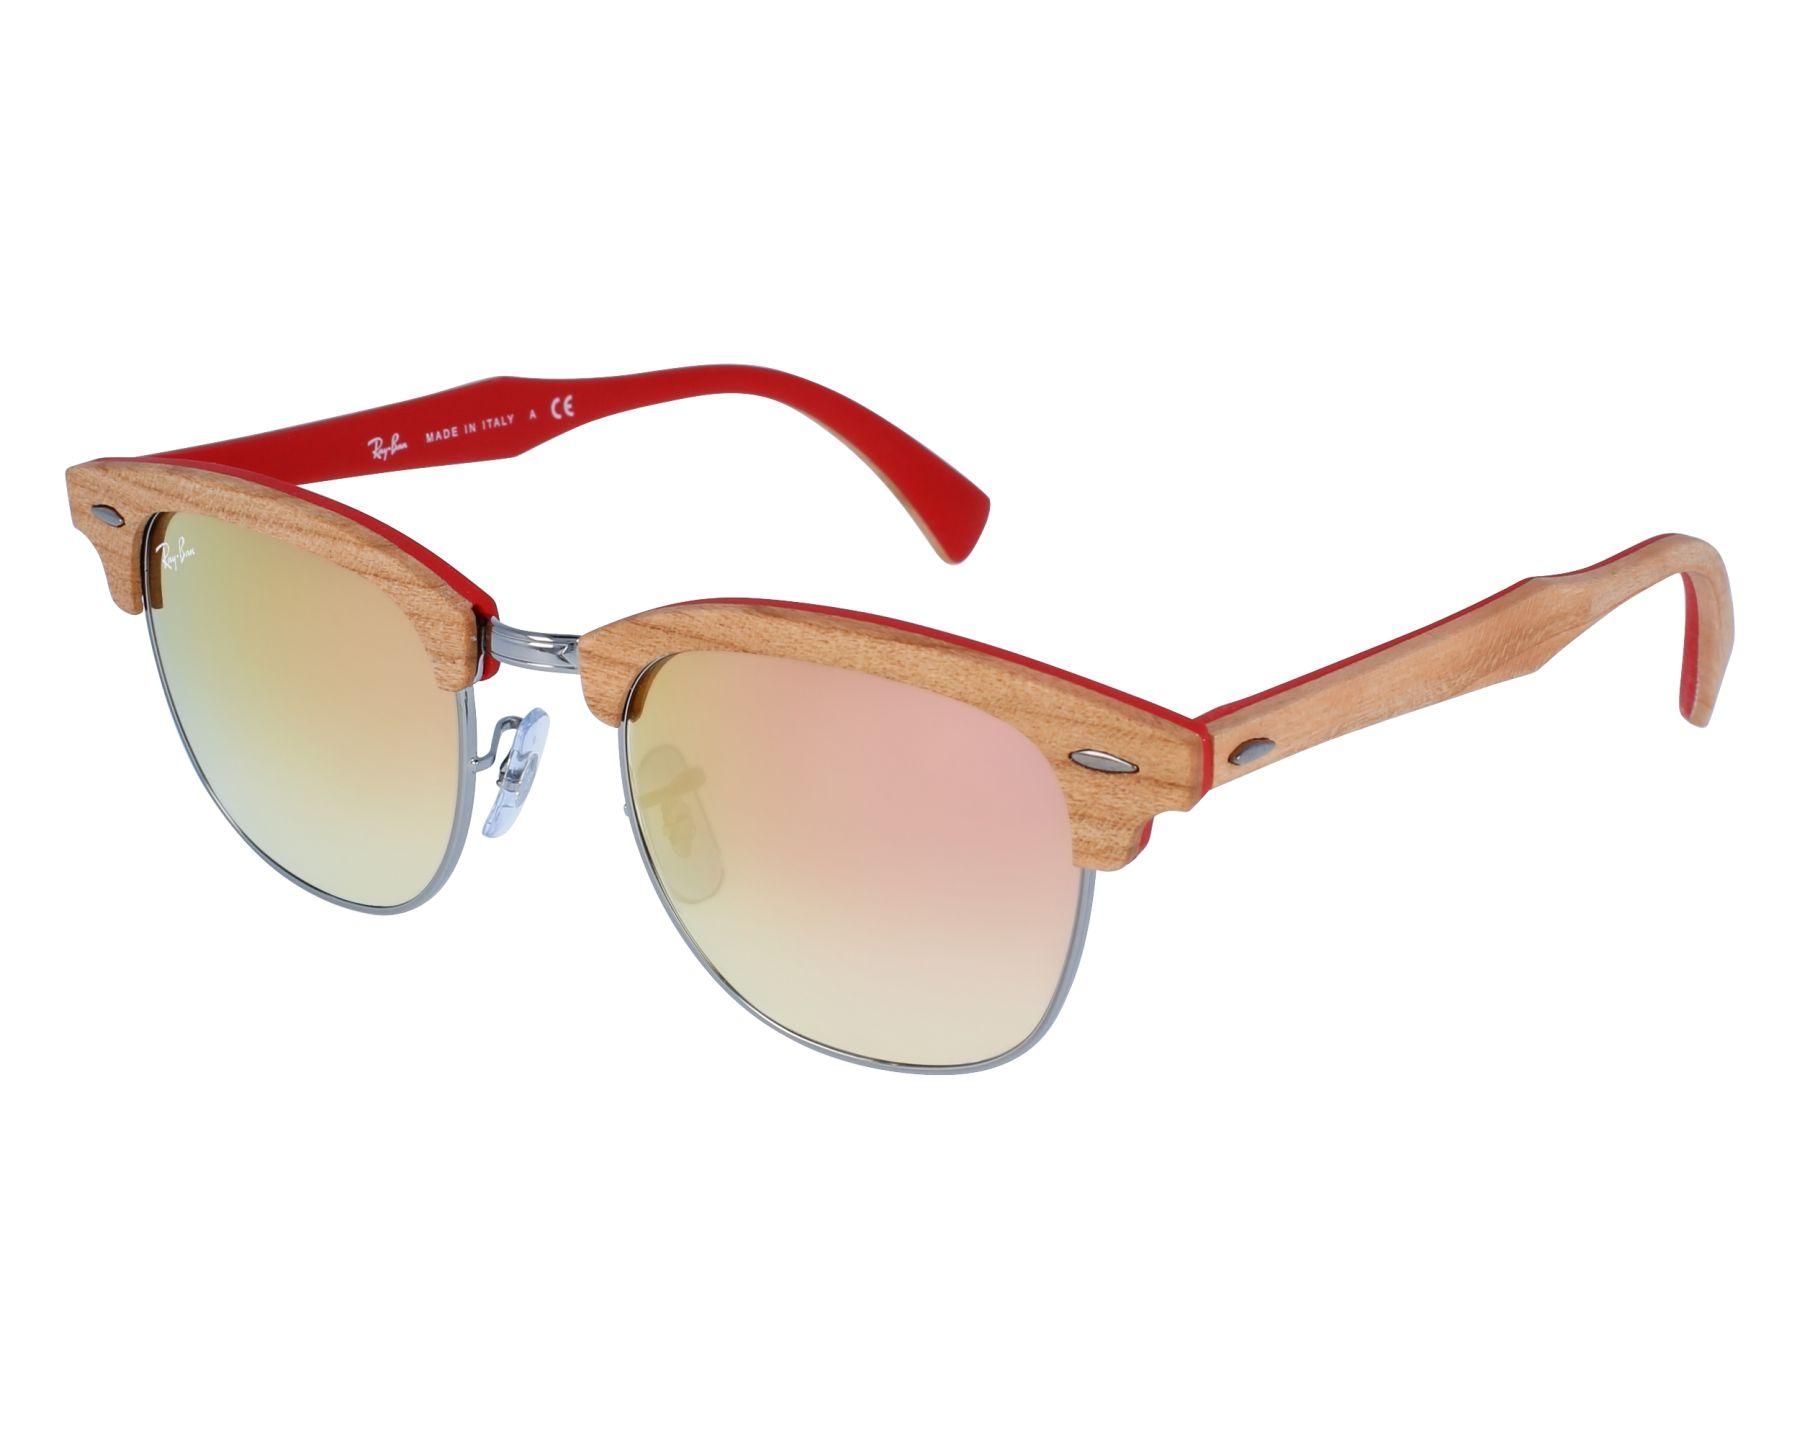 233c959e89 Gafas de Sol Ray-Ban Clubmaster Wood RB-3016-M 12197O